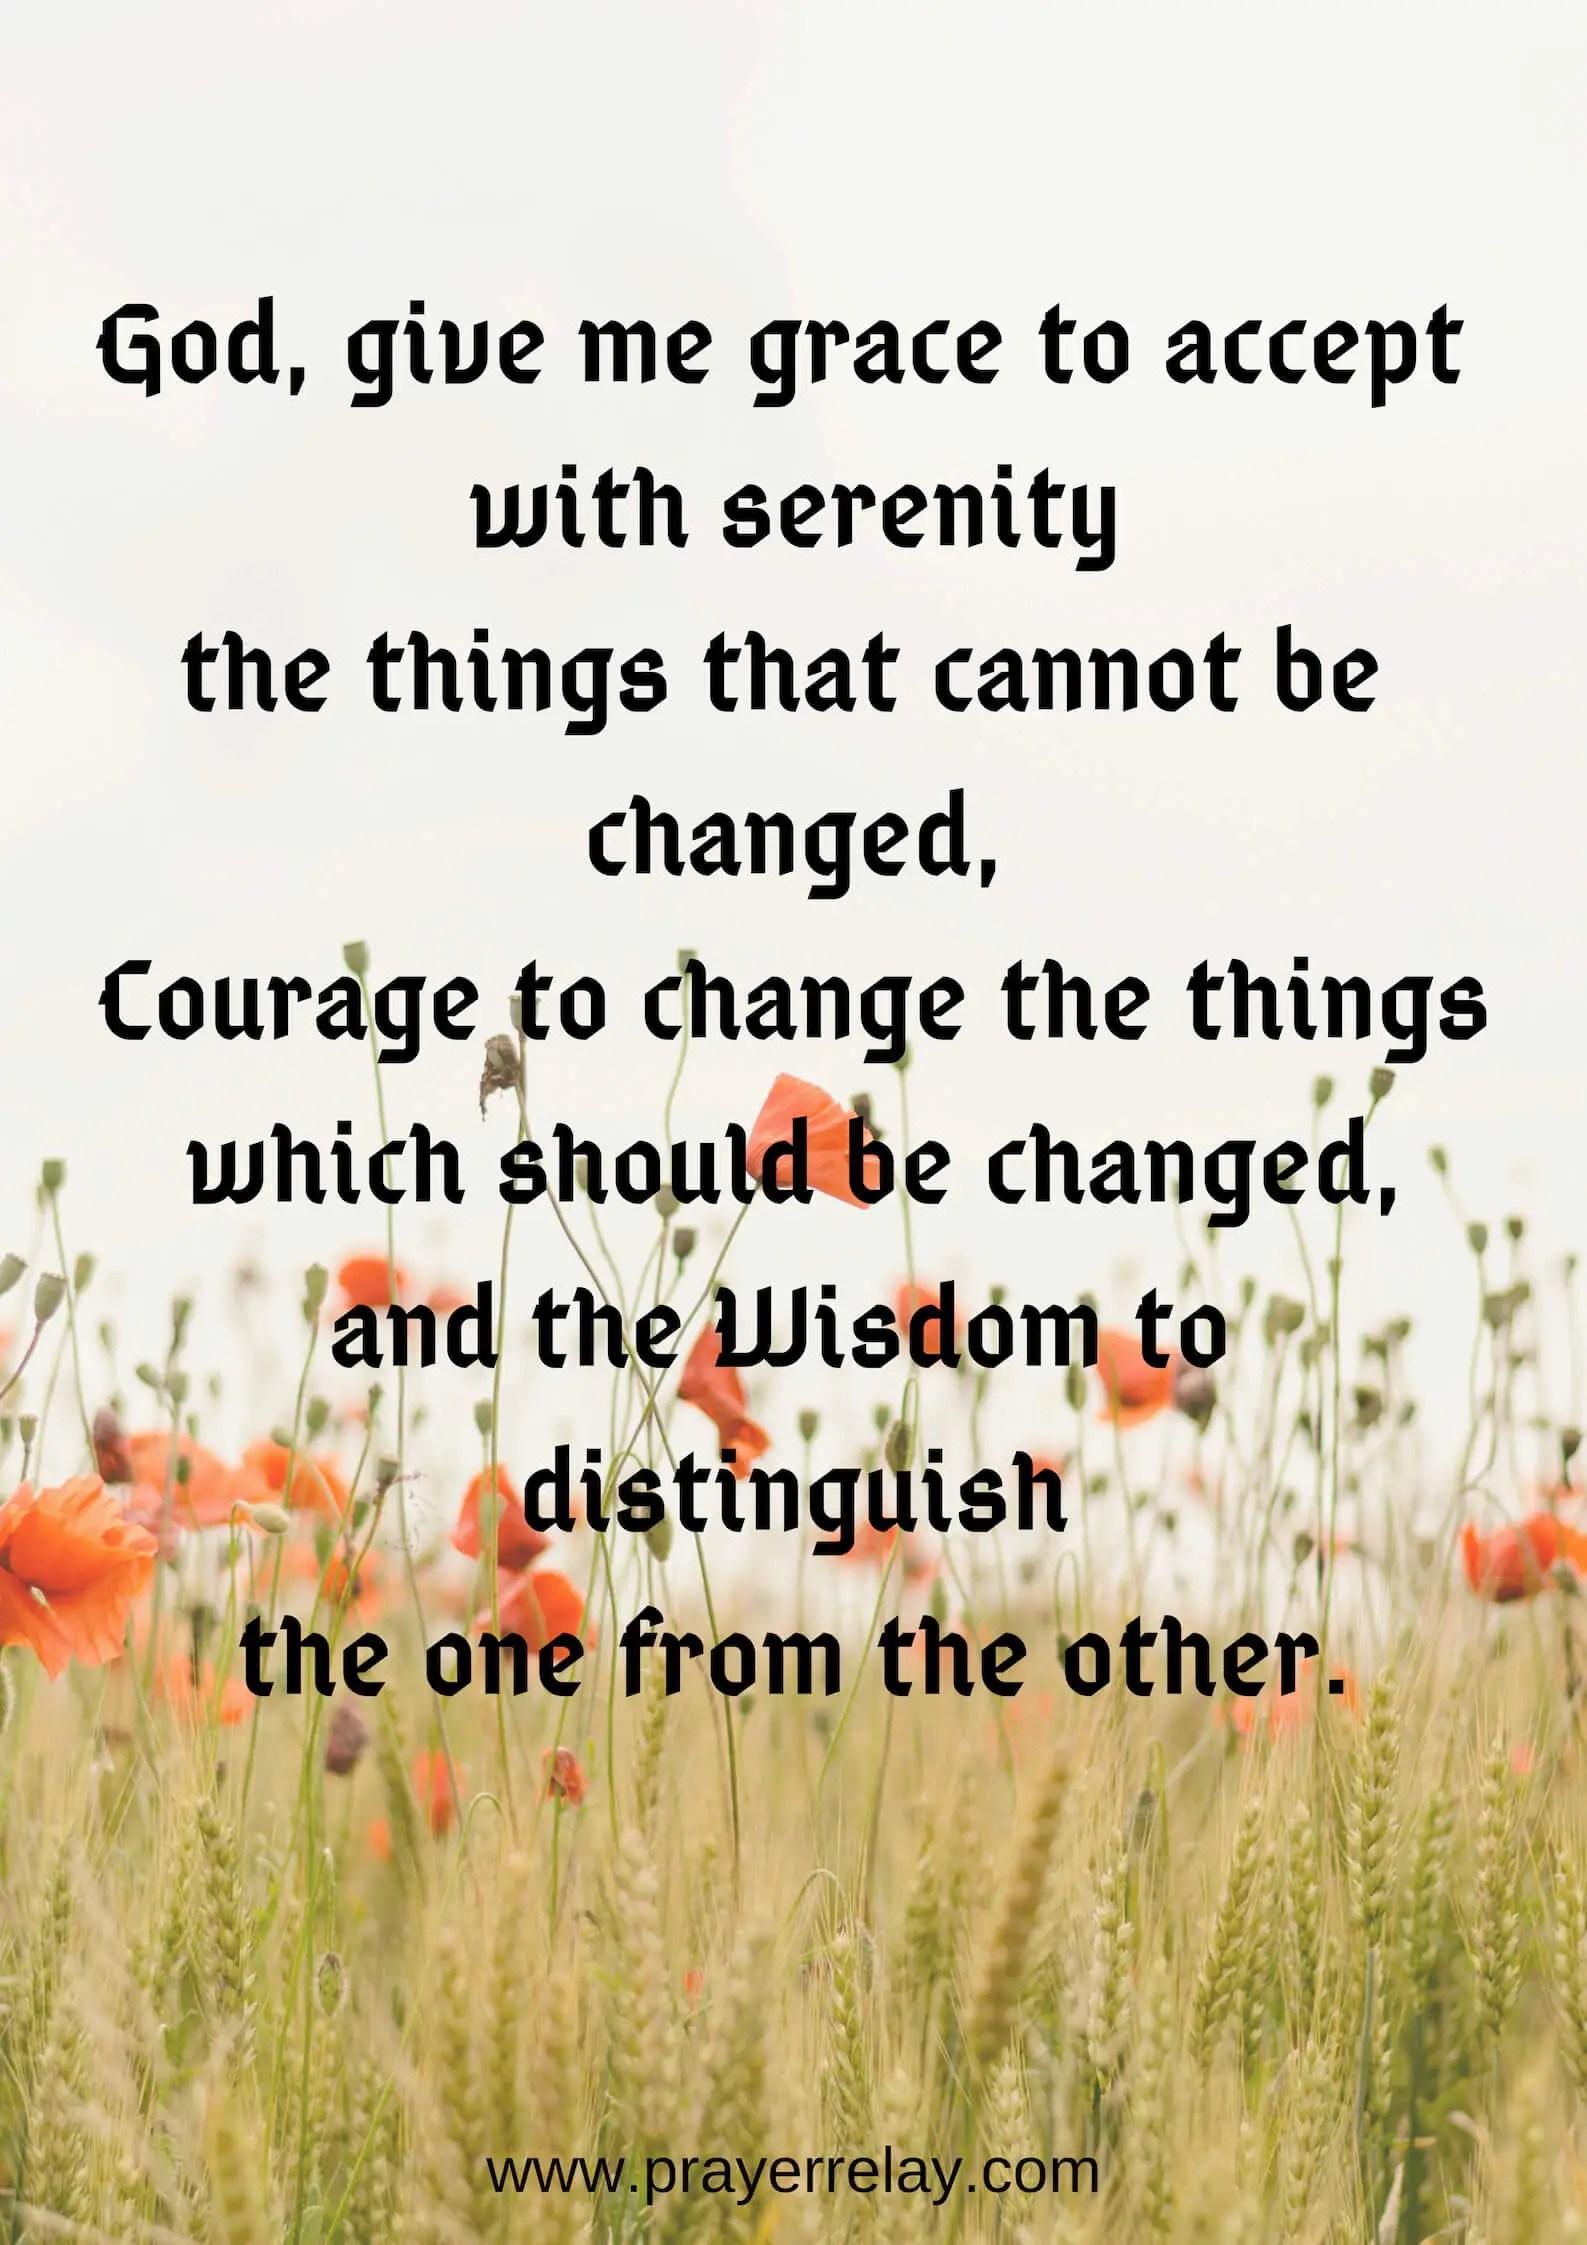 Serenity prayer quotes1